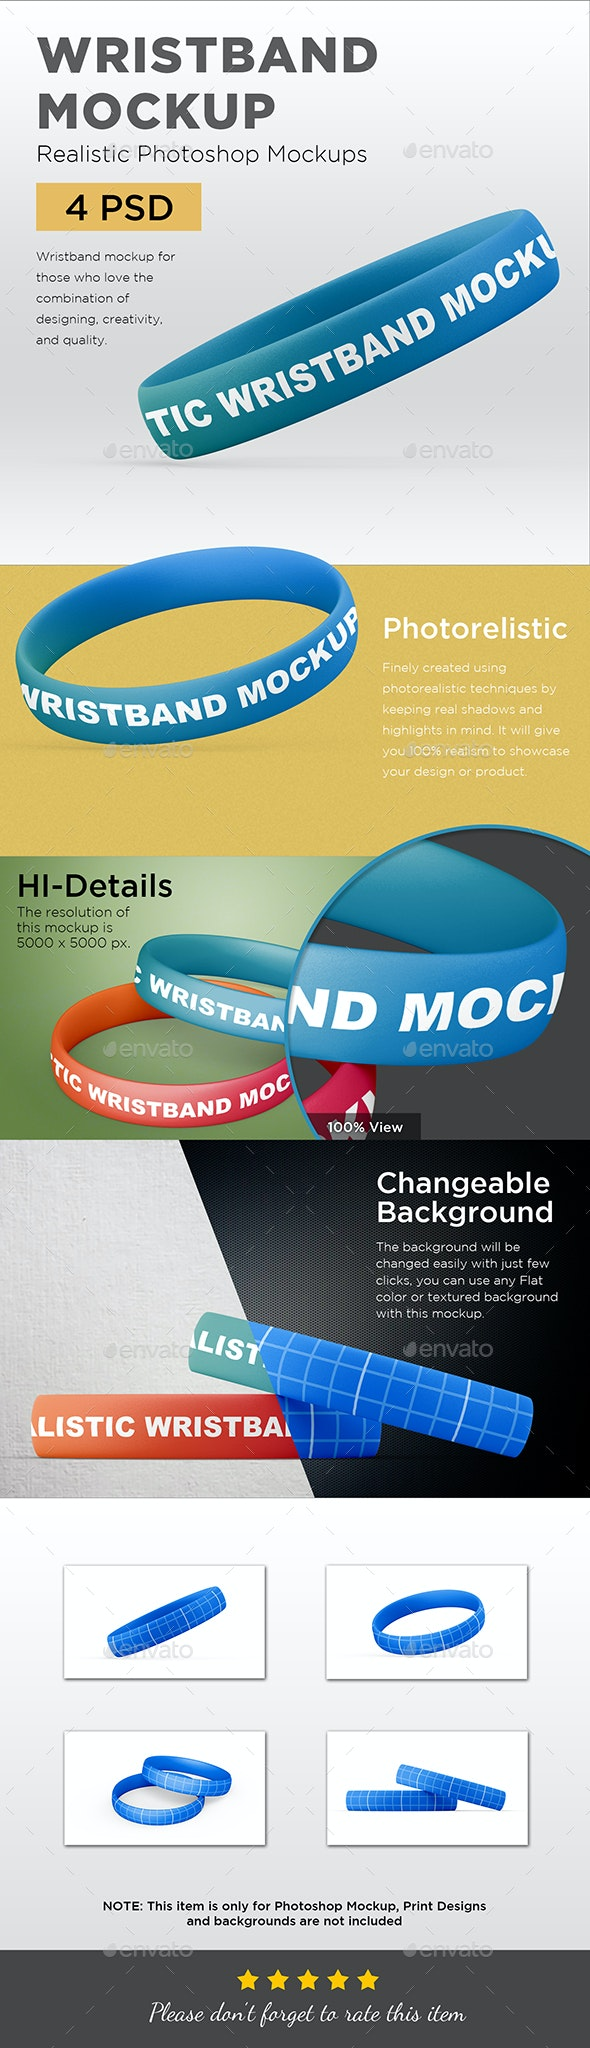 Rubber Wristband Mockup - Miscellaneous Apparel